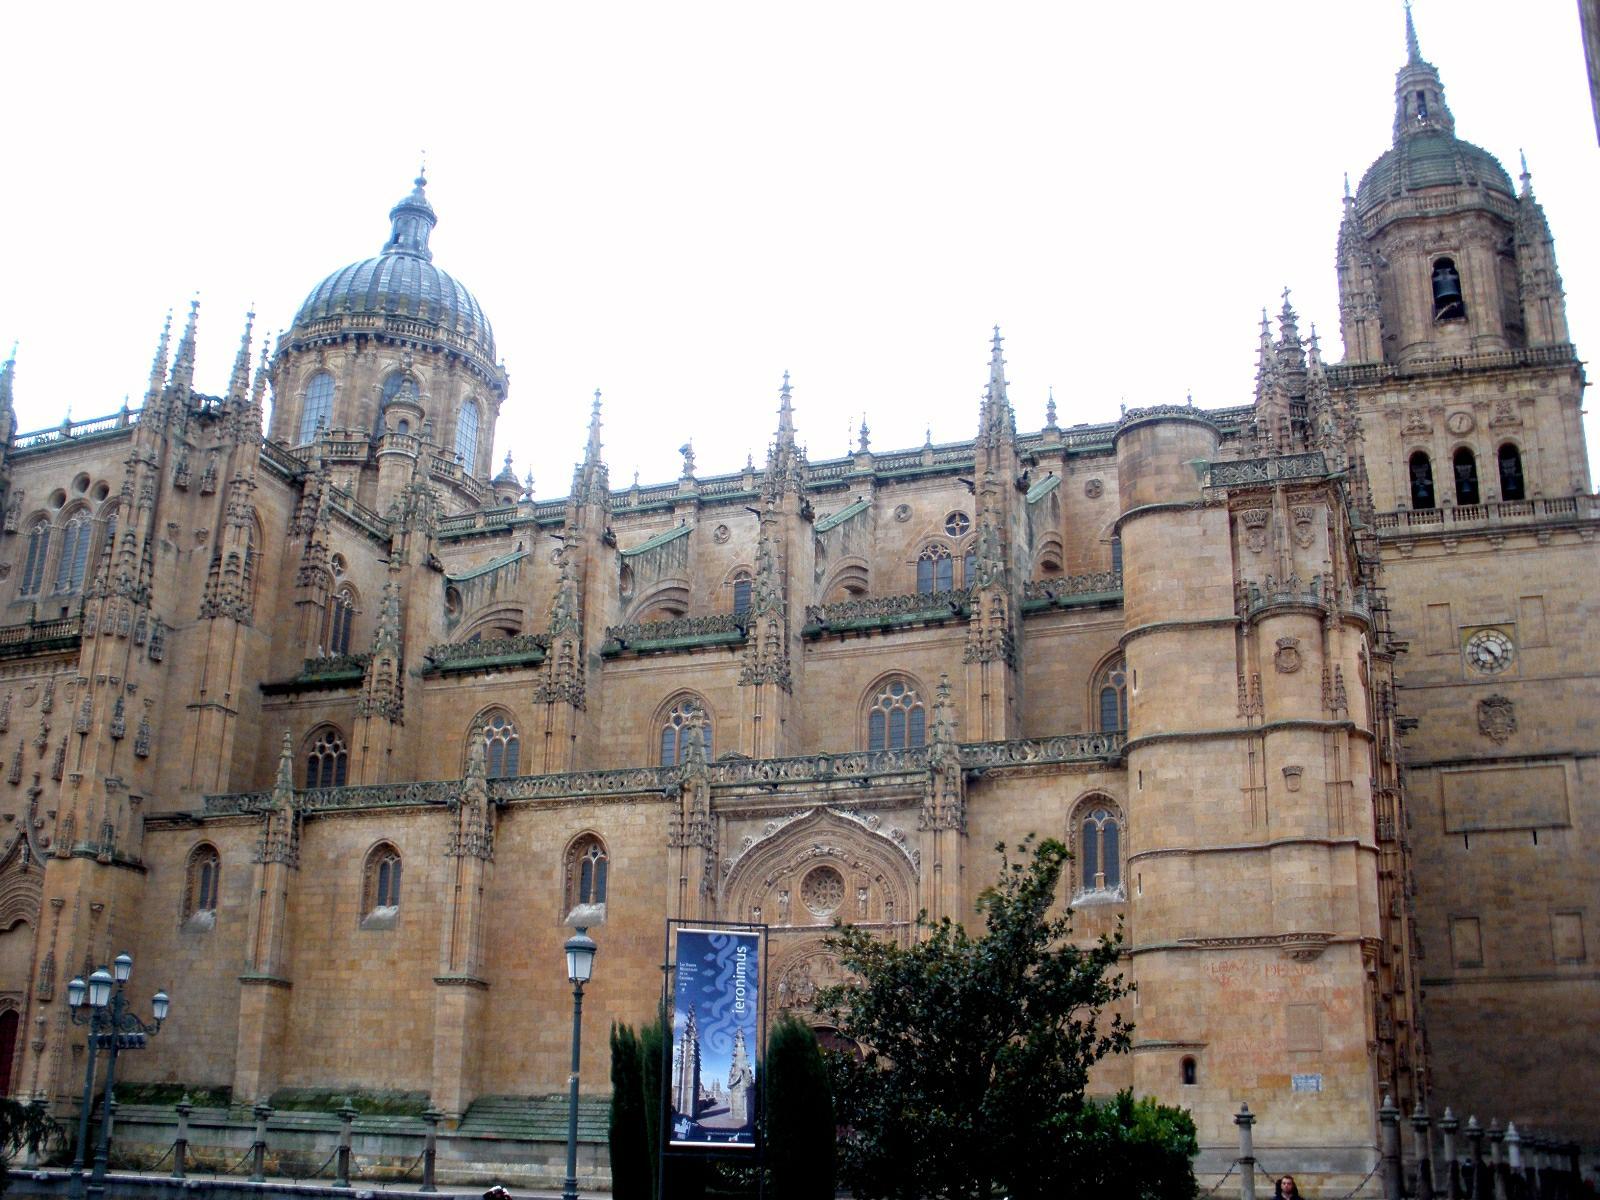 File:Salamanca - Catedral Nueva, exterior 01.jpg - Wikimedia Commons